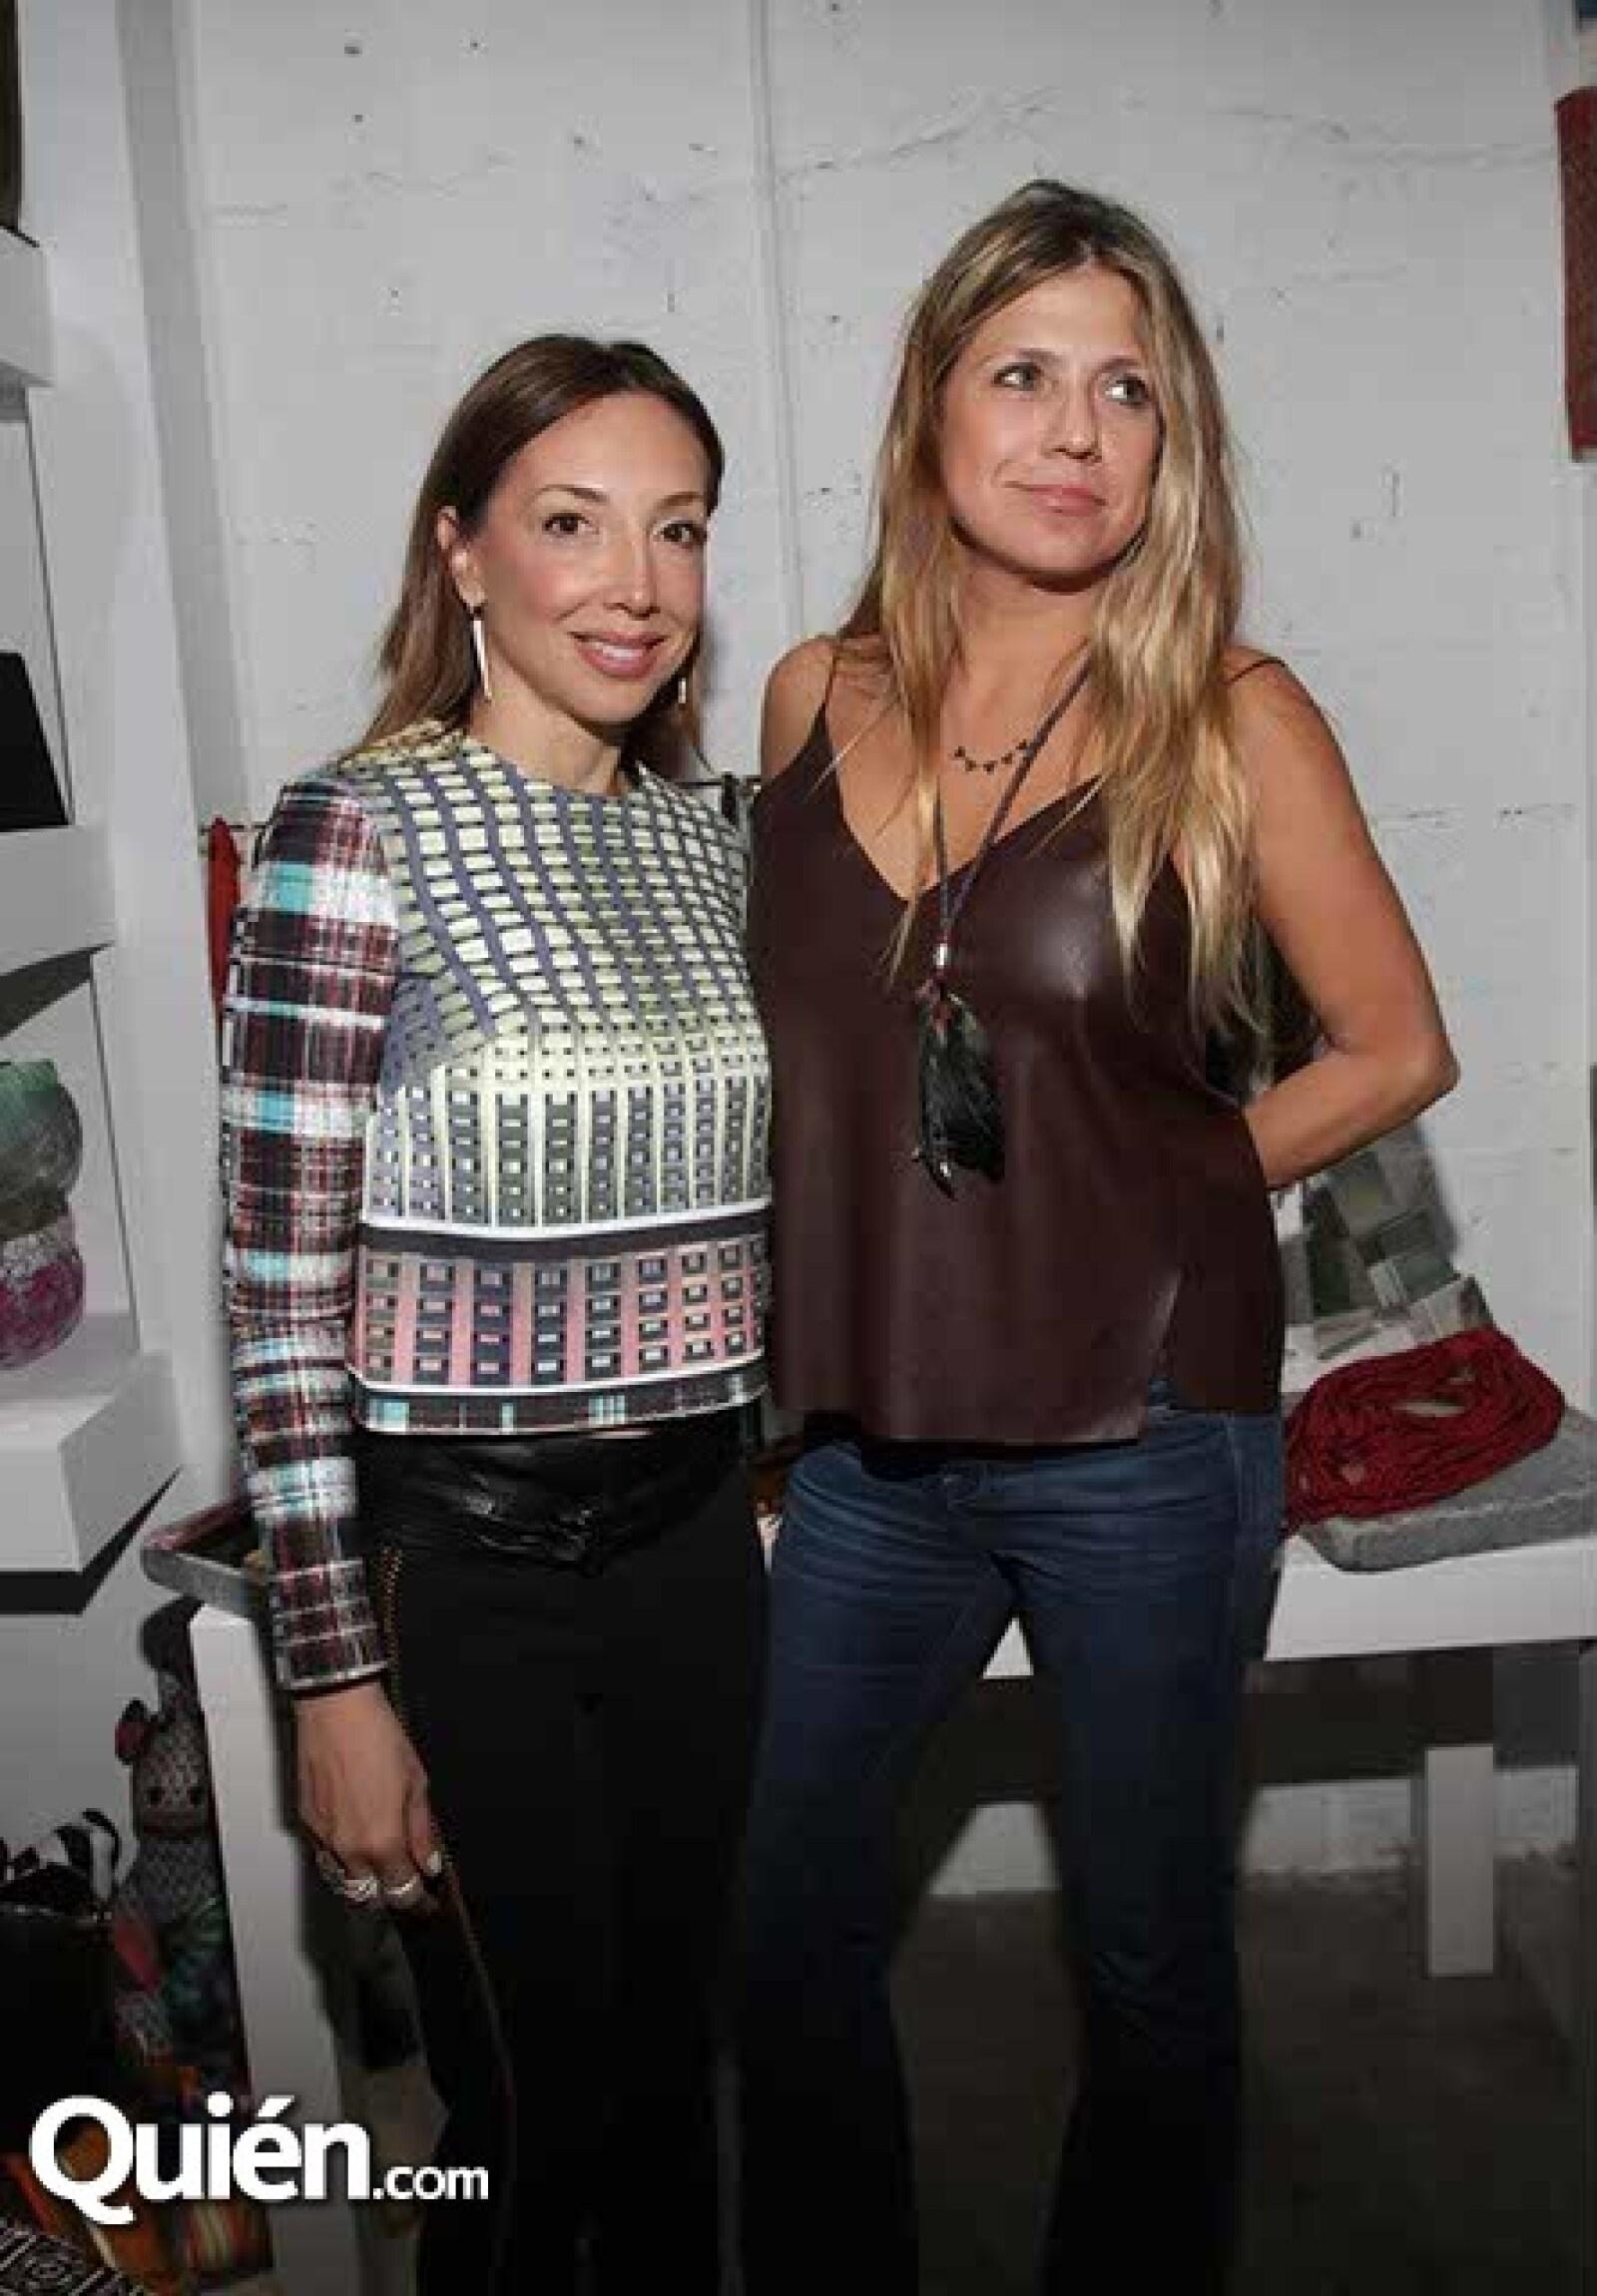 Carolina Gómez y Tuti Bruzual